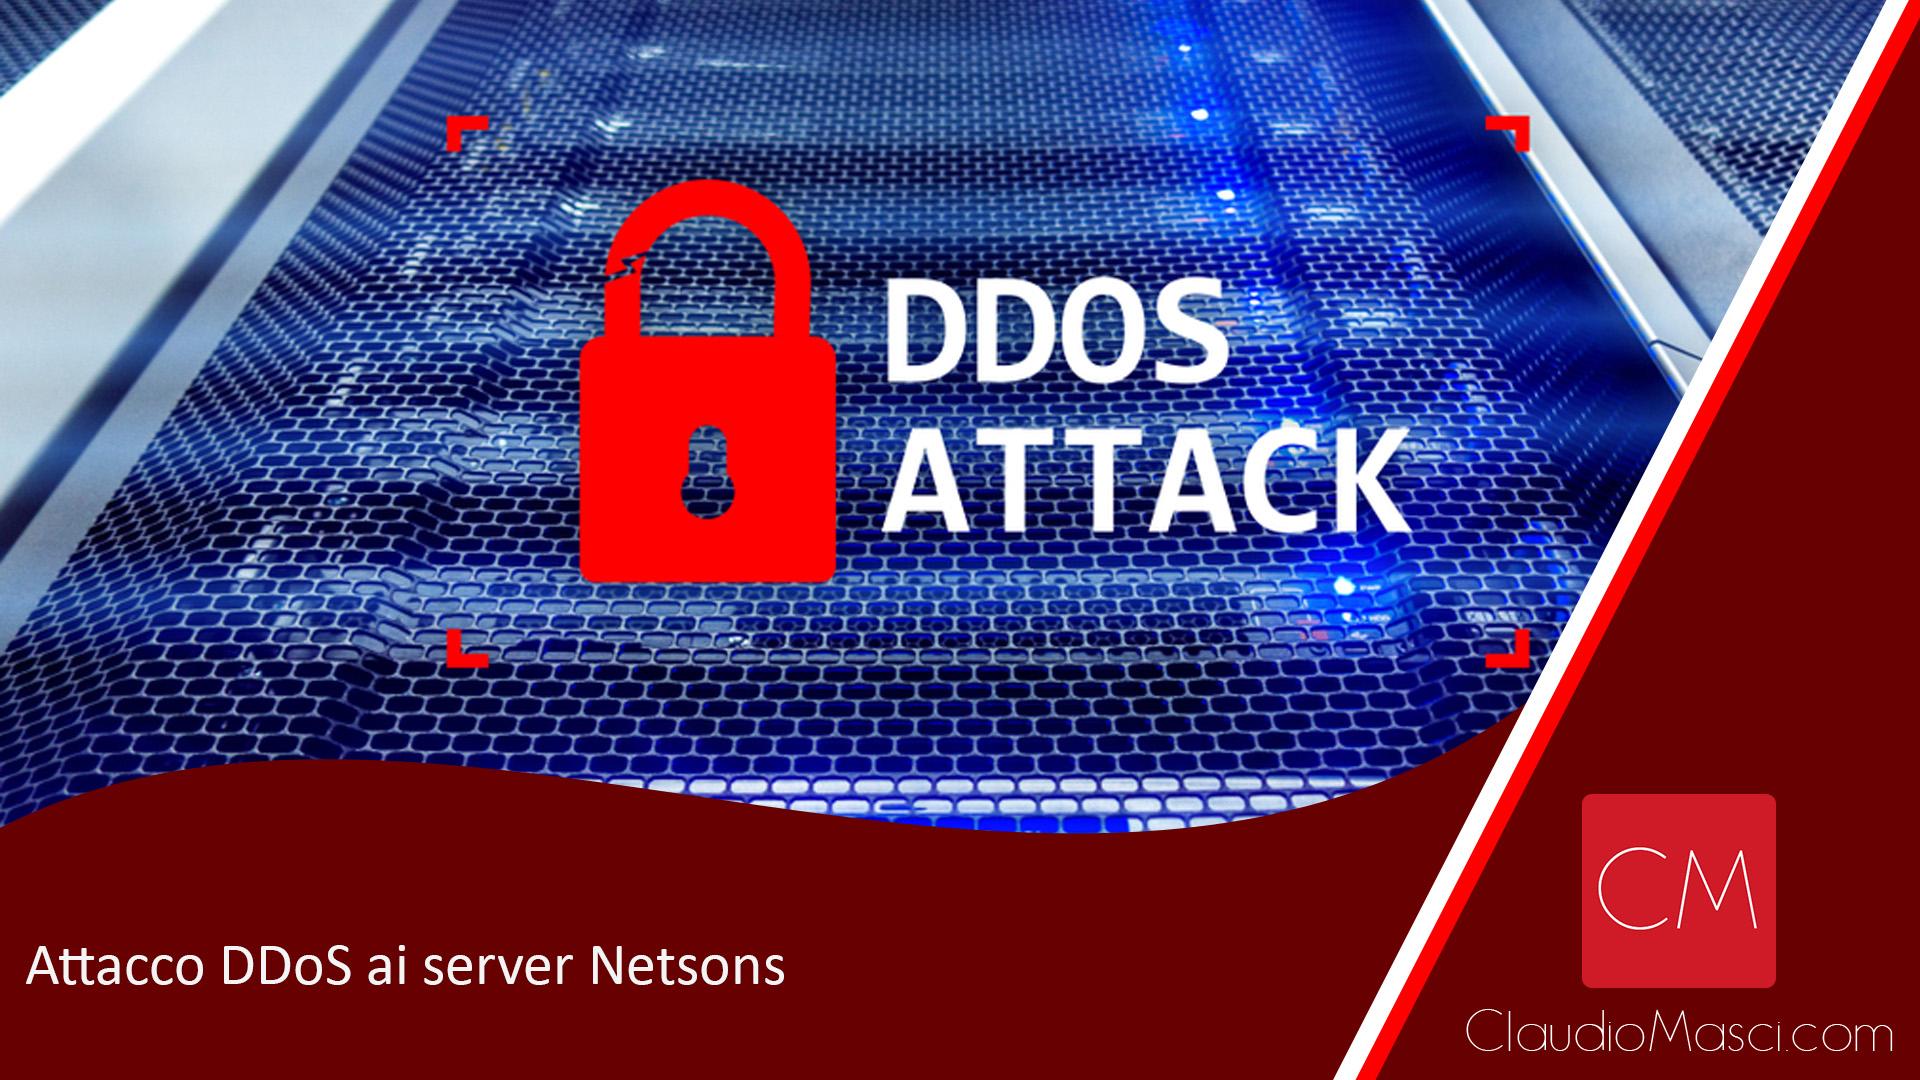 Attacco DDoS ai server Netsons